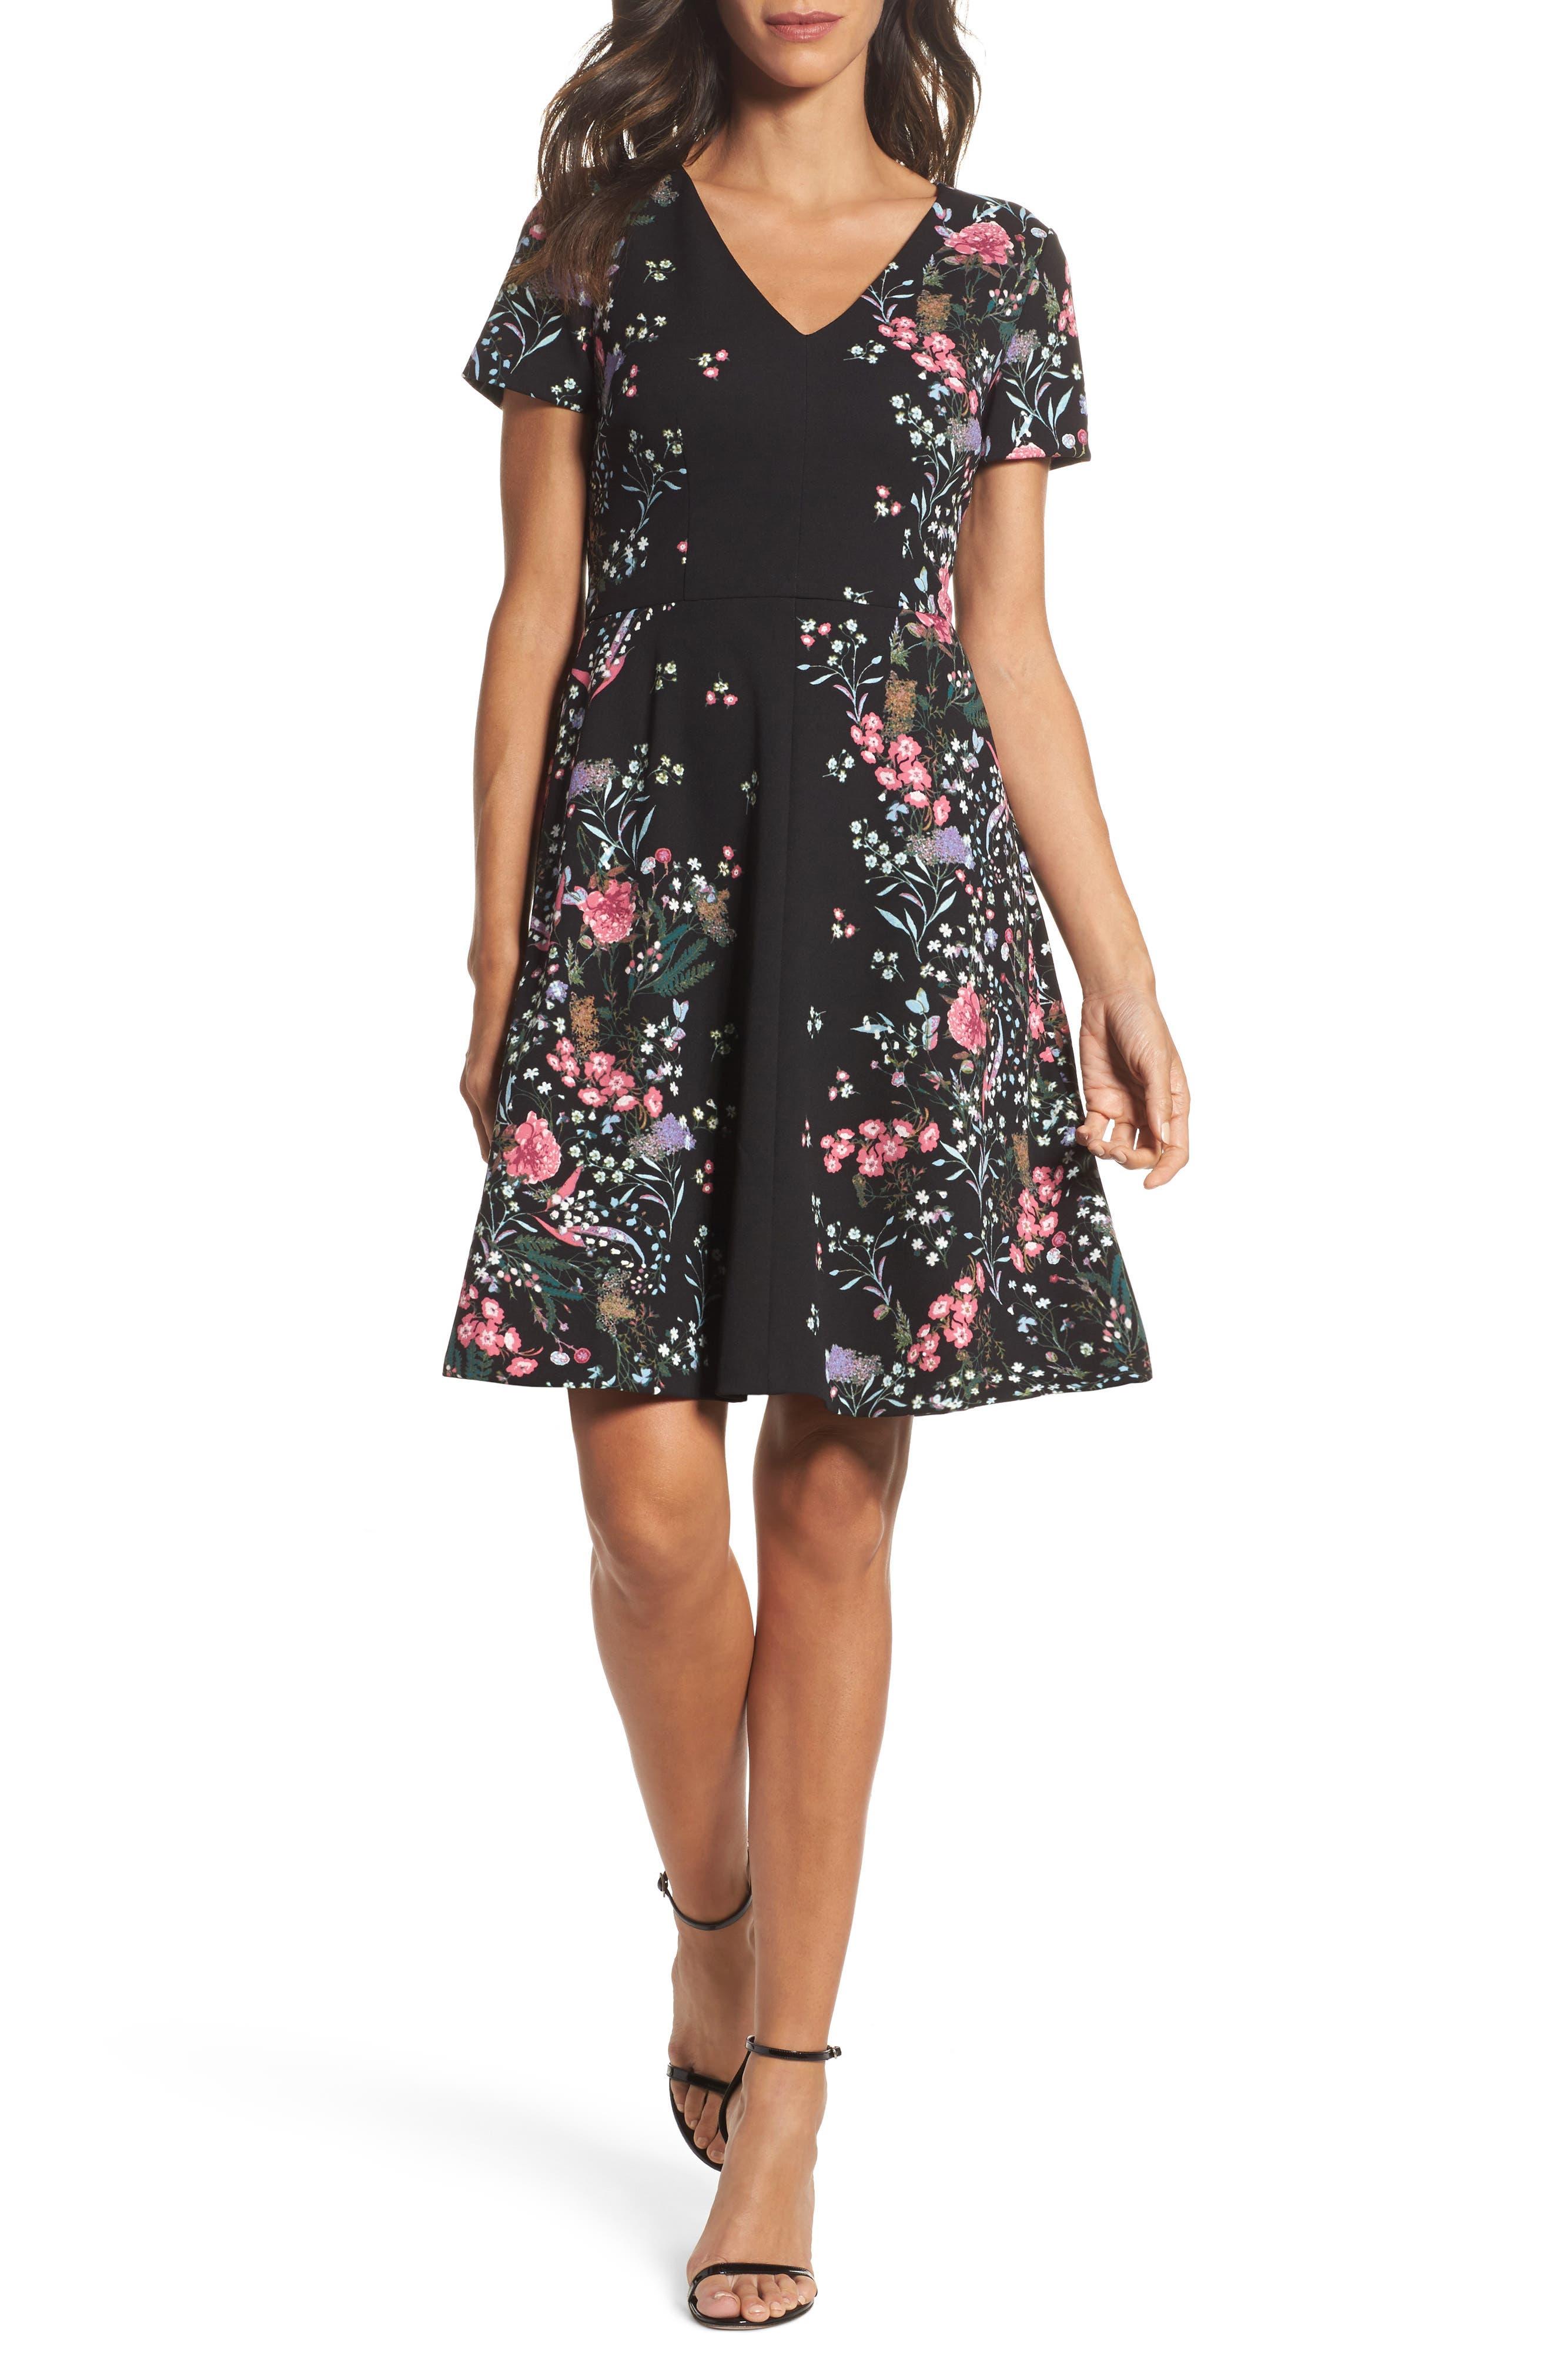 Main Image - Adrianna Papell Print Scuba Knit Fit & Flare Dress (Regular & Petite)